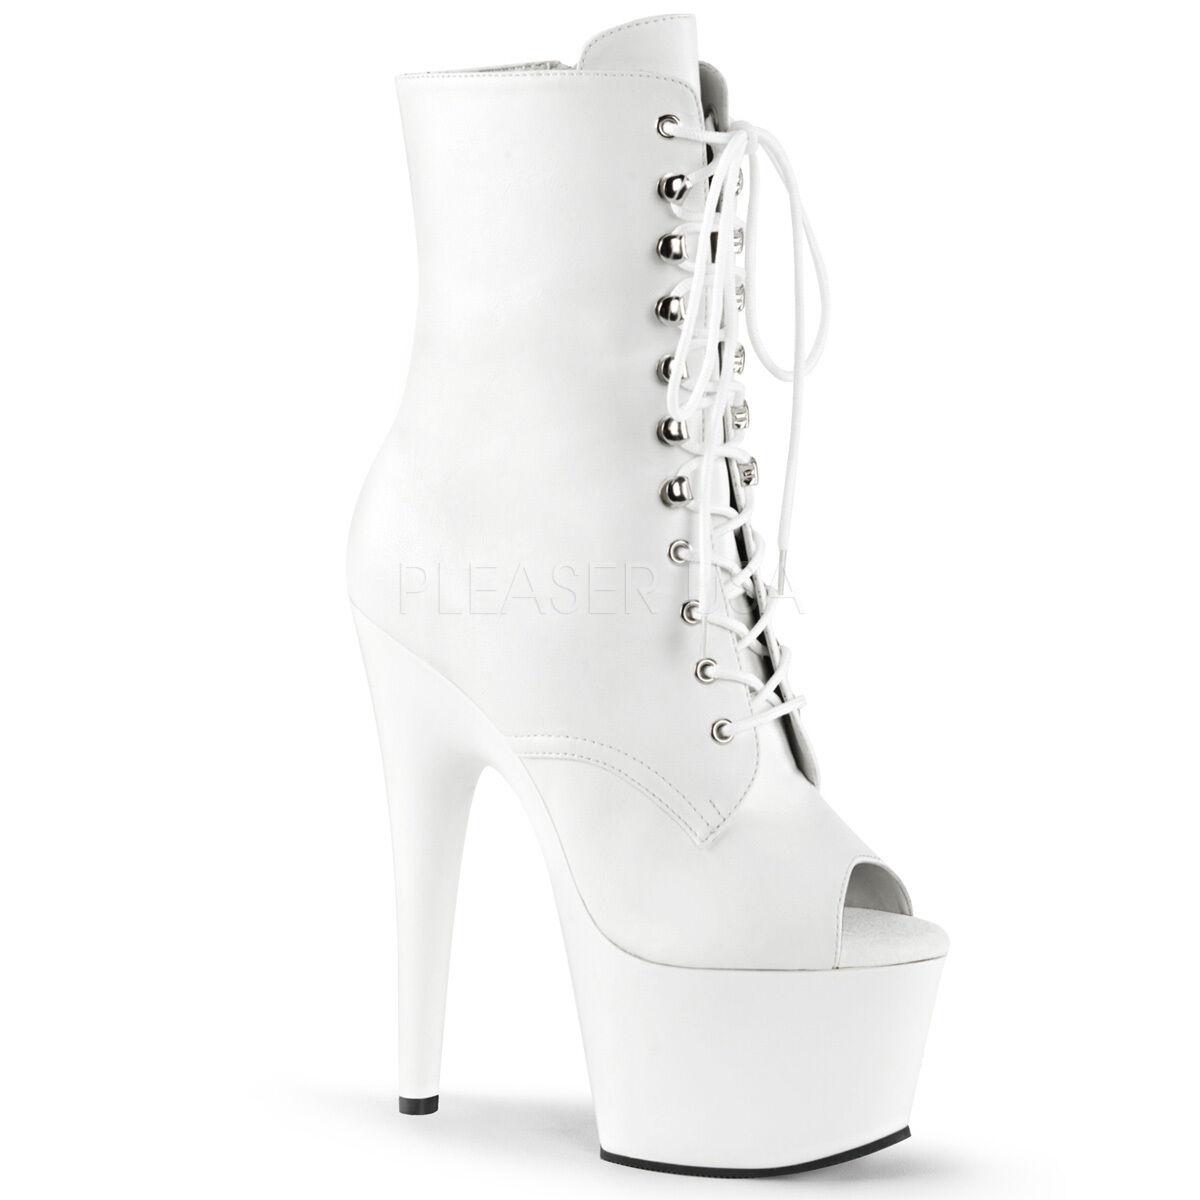 Sexy Stripper Plataforma Peep Toe 7  Tacón Alto botas botas botas al Tobillo blancoo ADO1021 WPU M  barato